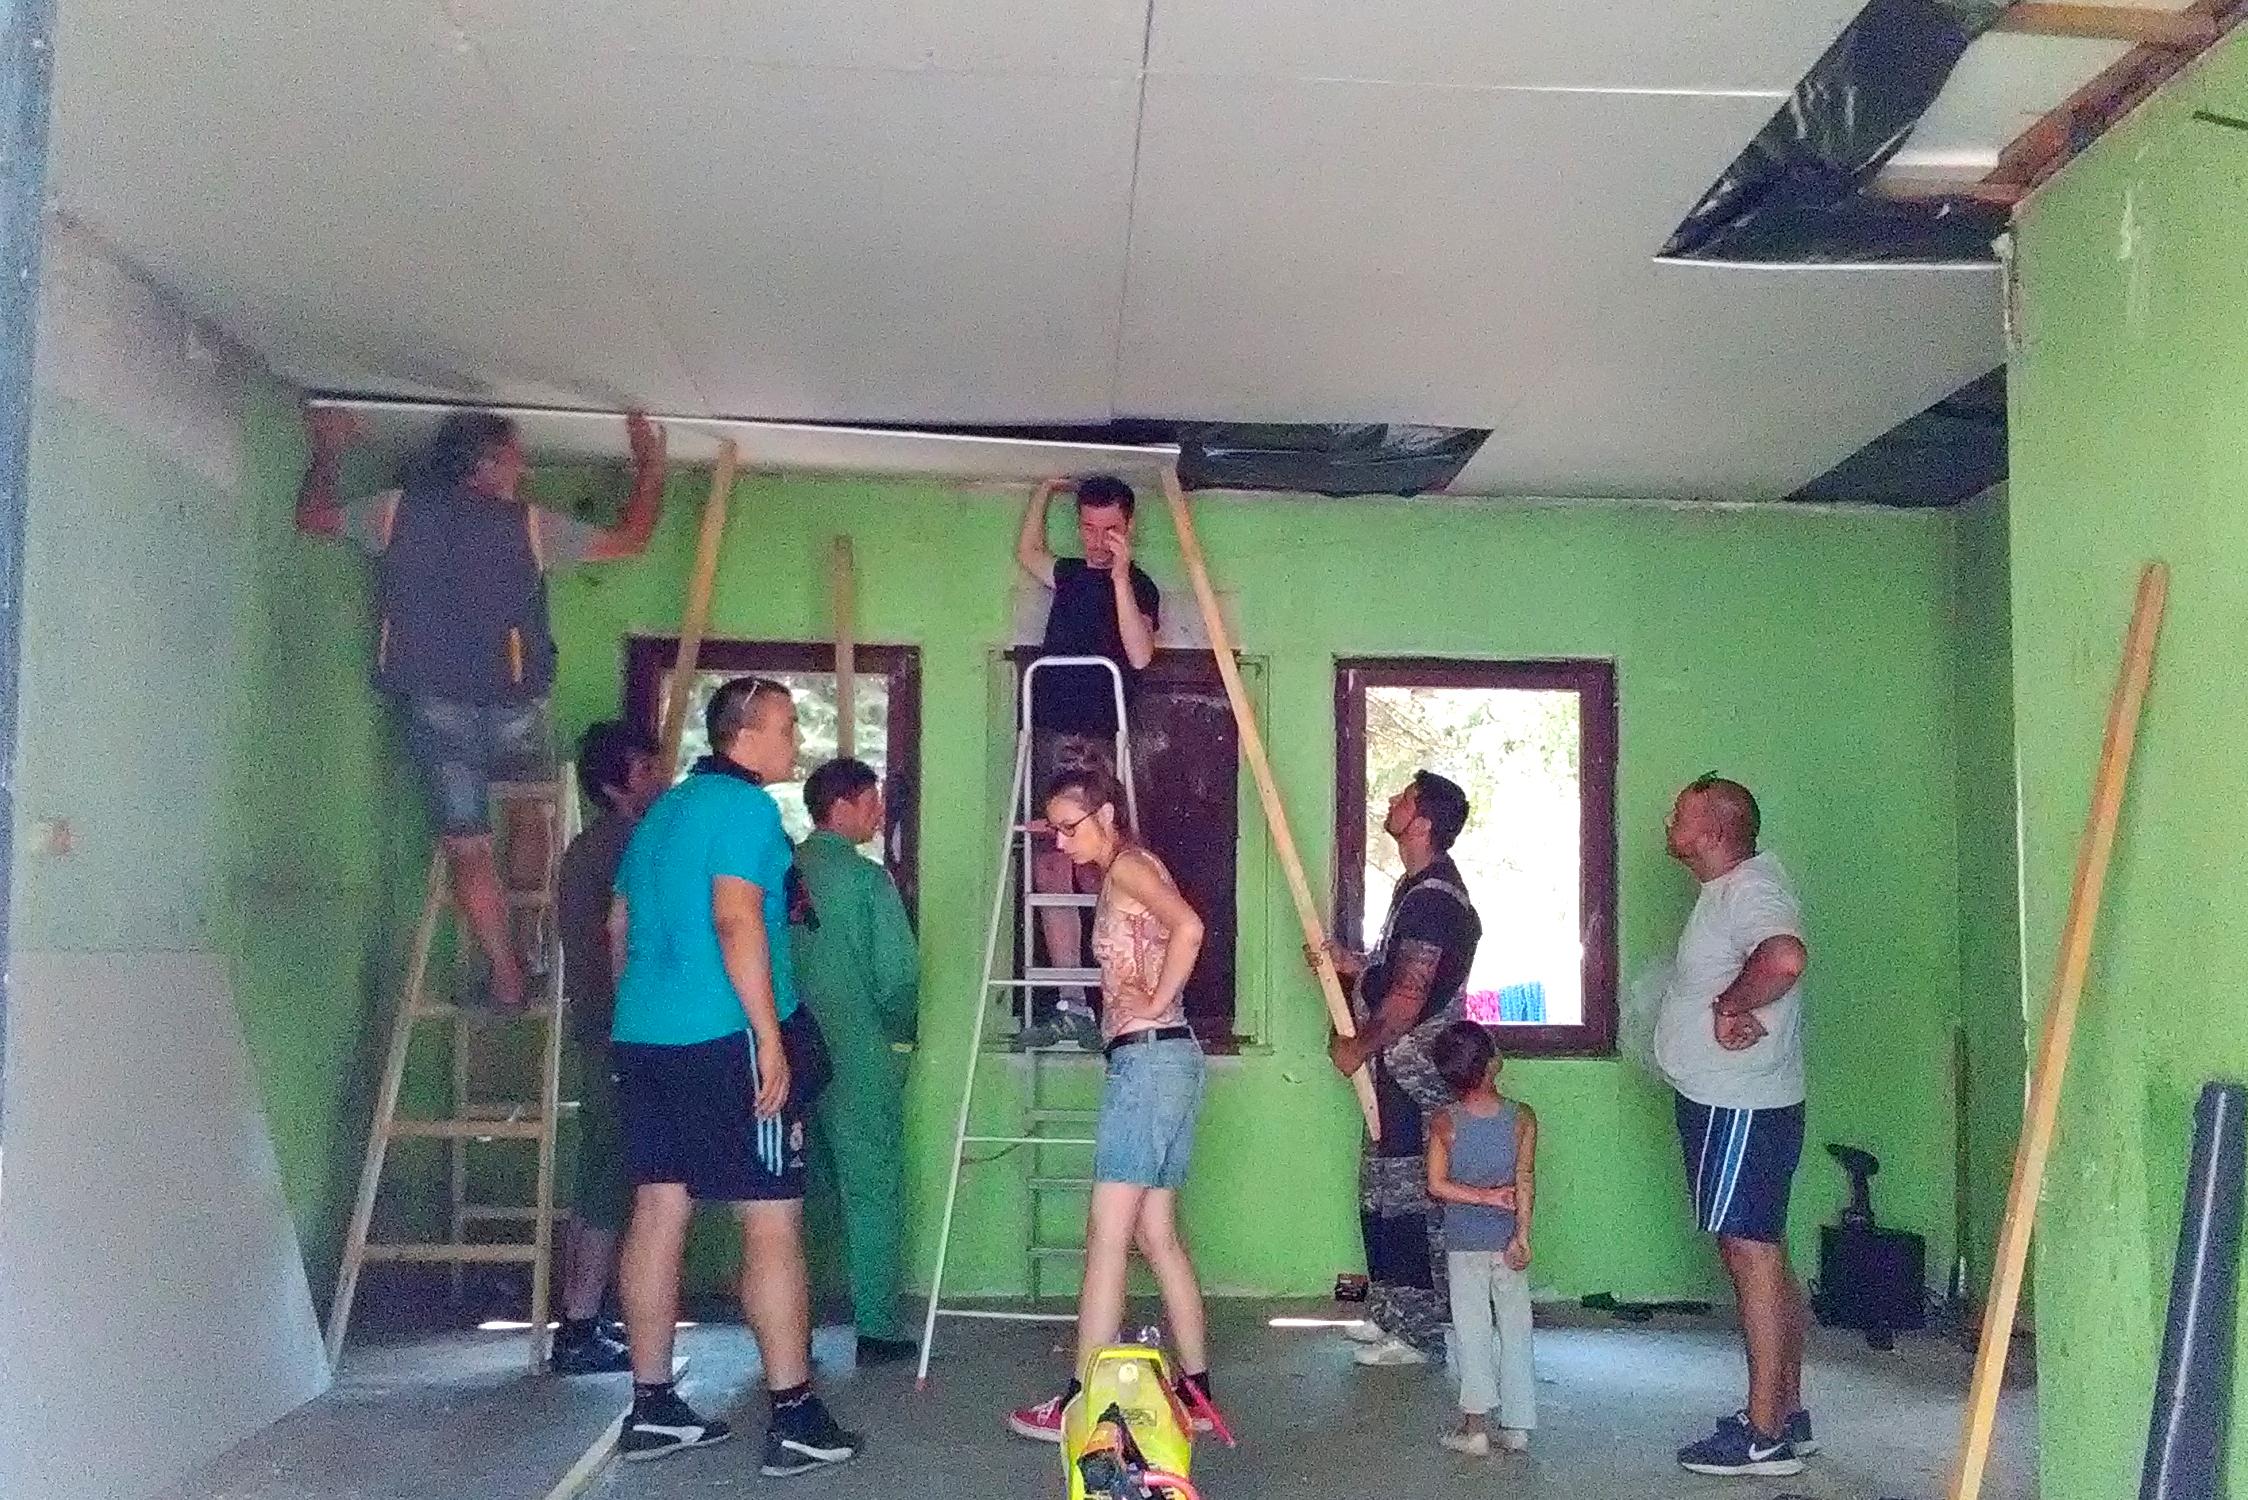 Poruka Združene akcije Krov nad glavom: Popravili smo krov i odbranićemo ga!